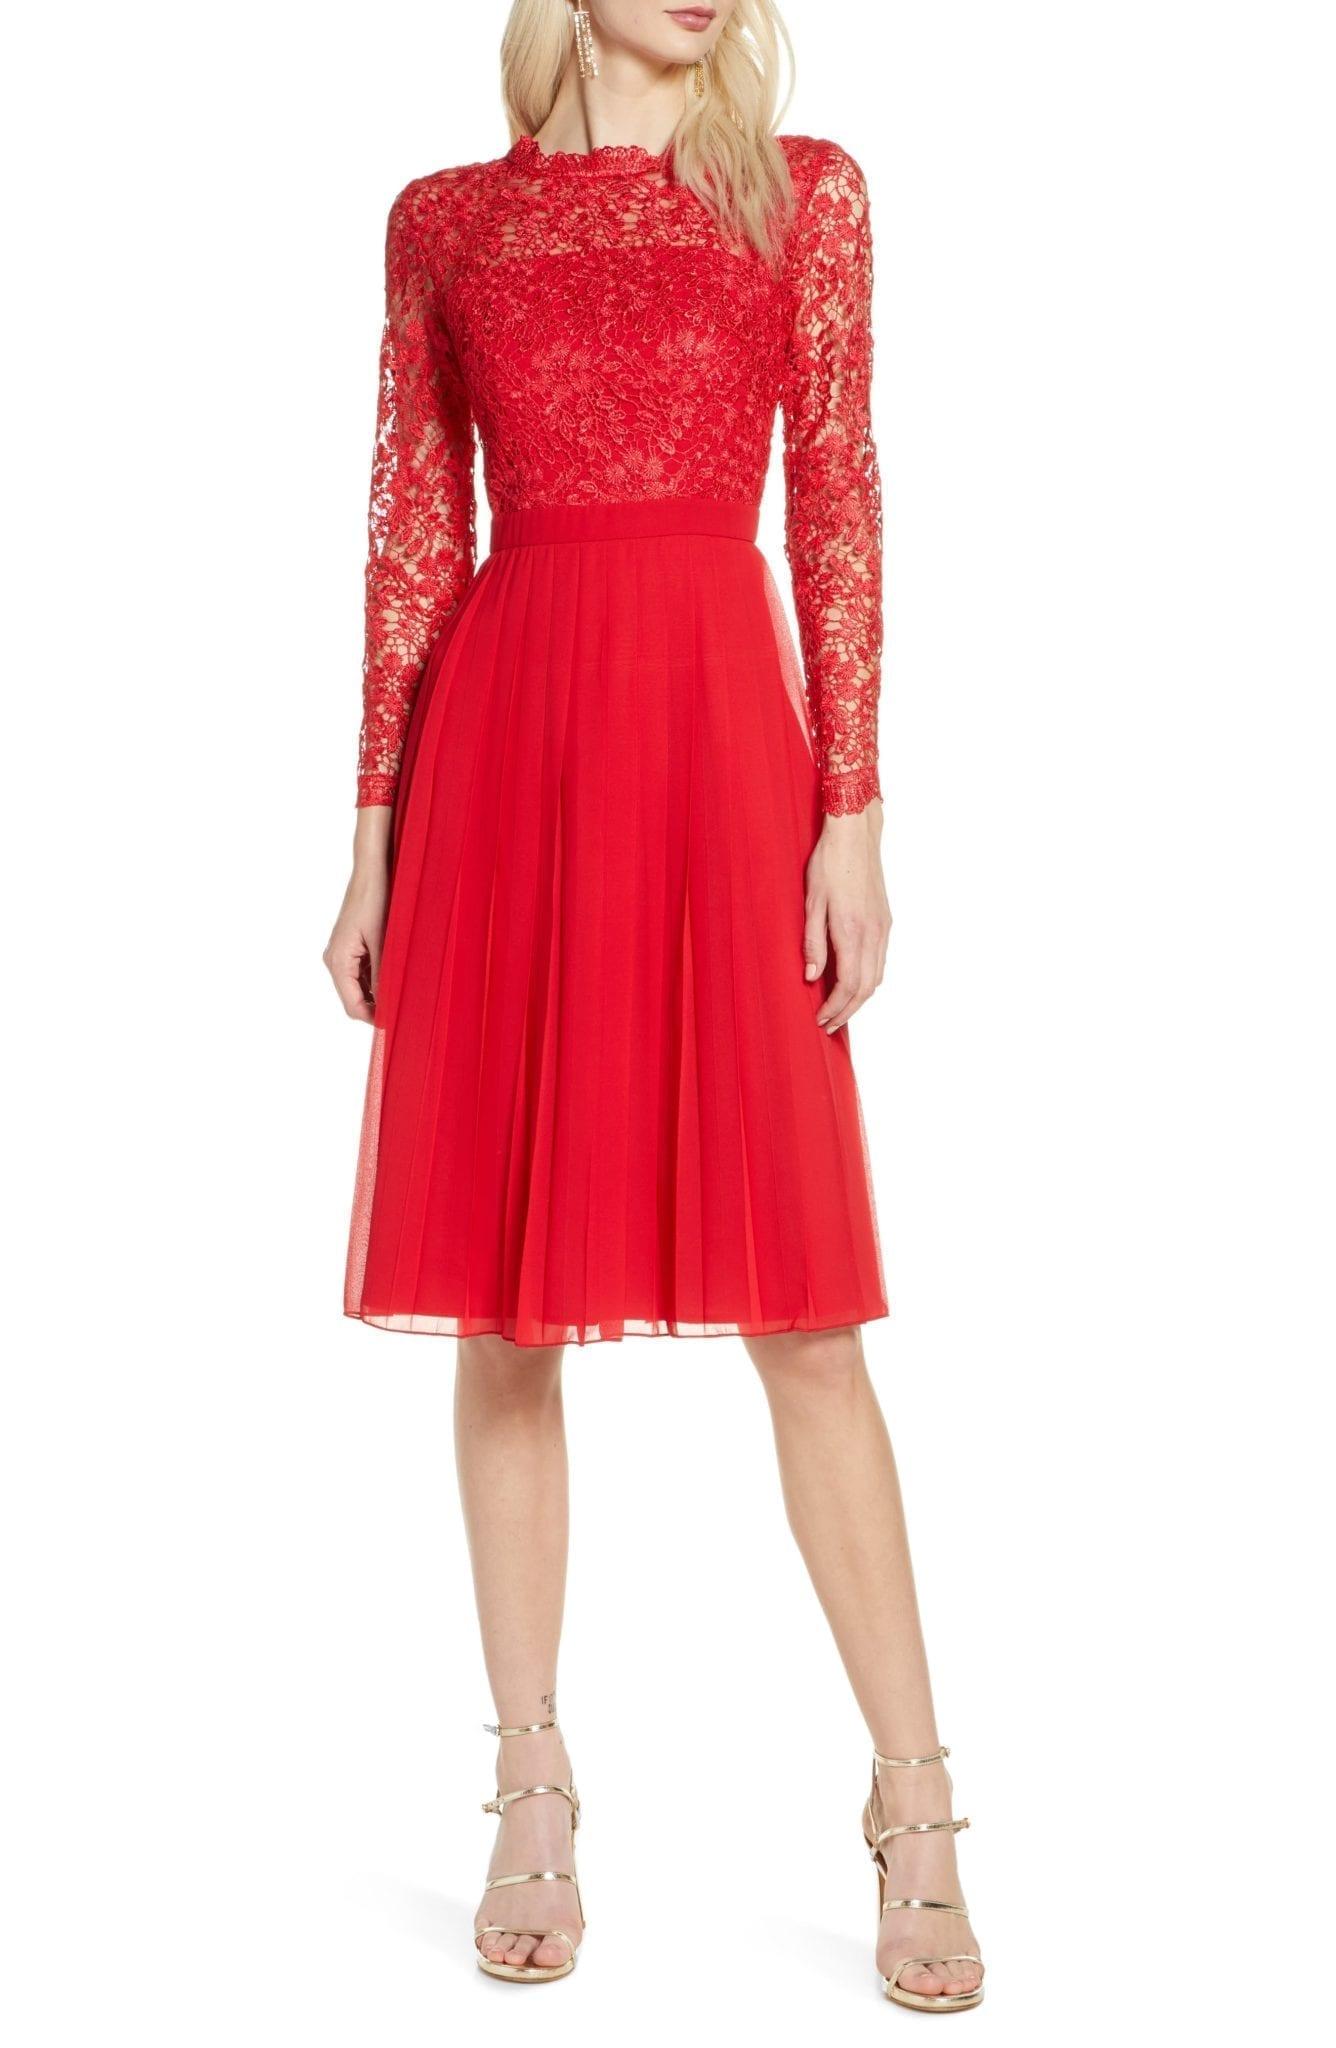 CHI CHI LONDON Naarah Long Sleeve Lace Bodice Chiffon Cocktail Dress